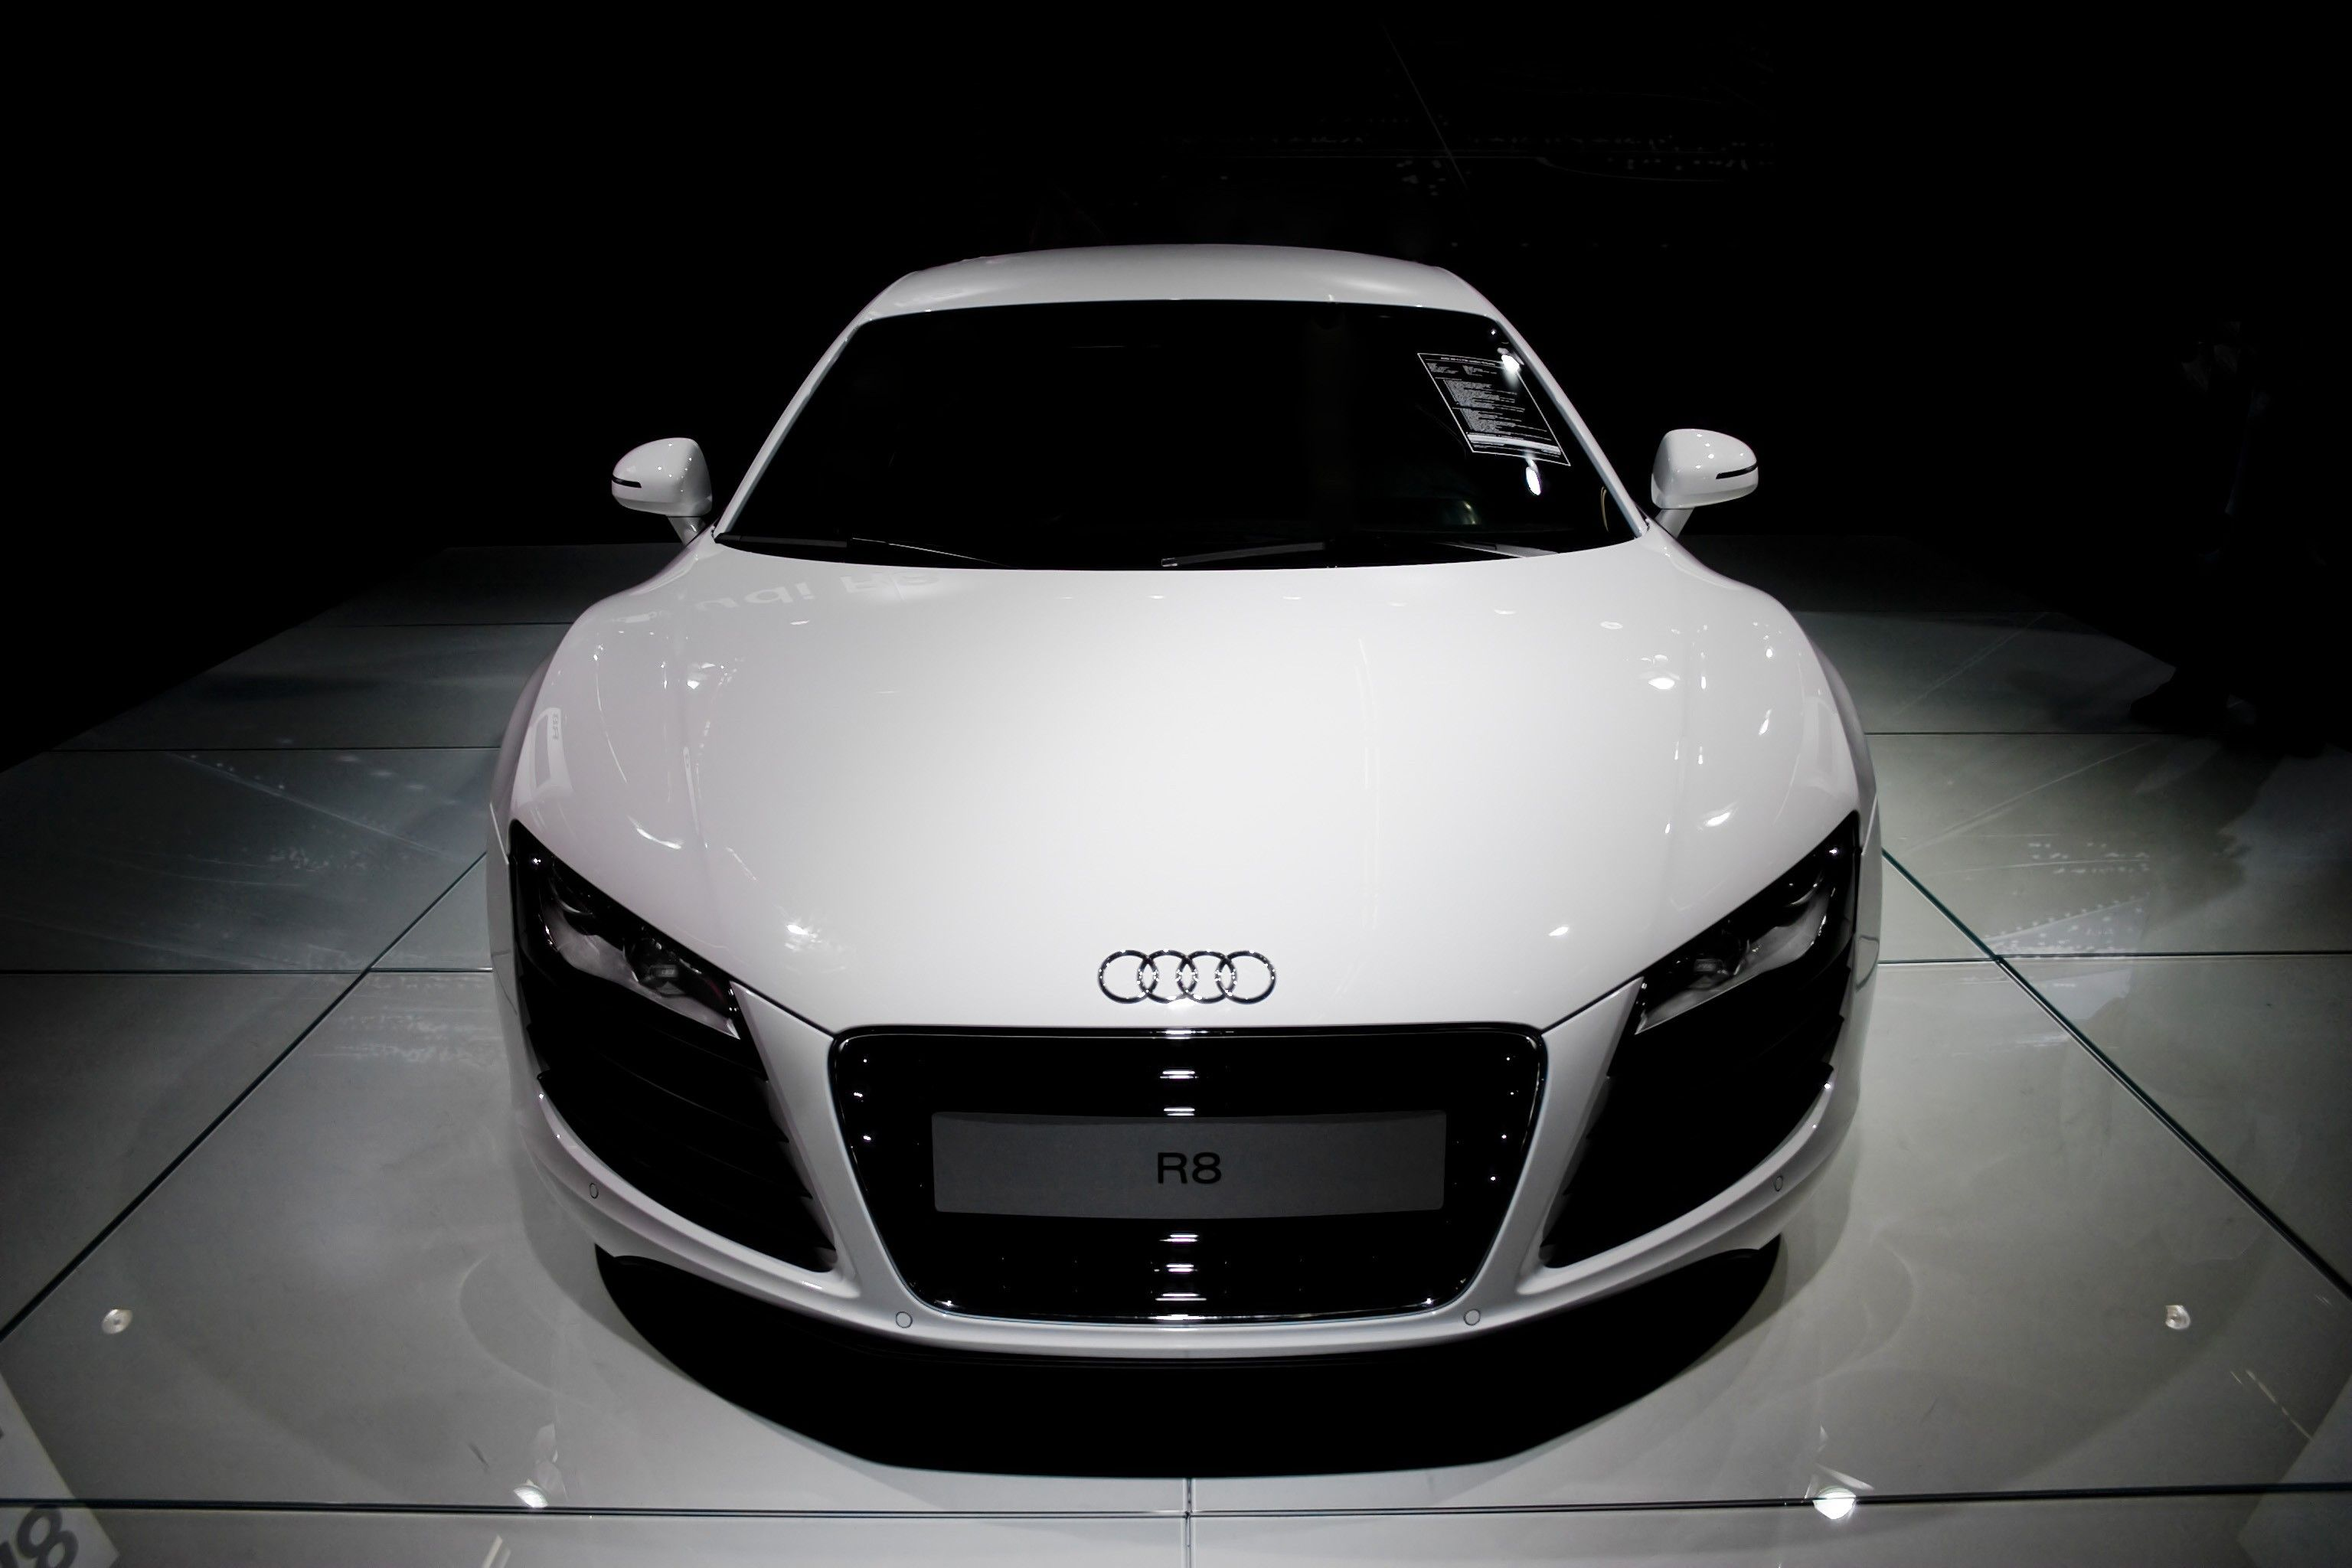 Audi R8 Wallpaper Automotive Design And Latest Car Models Audi R8 Wallpaper Audi Sports Car Wallpaper